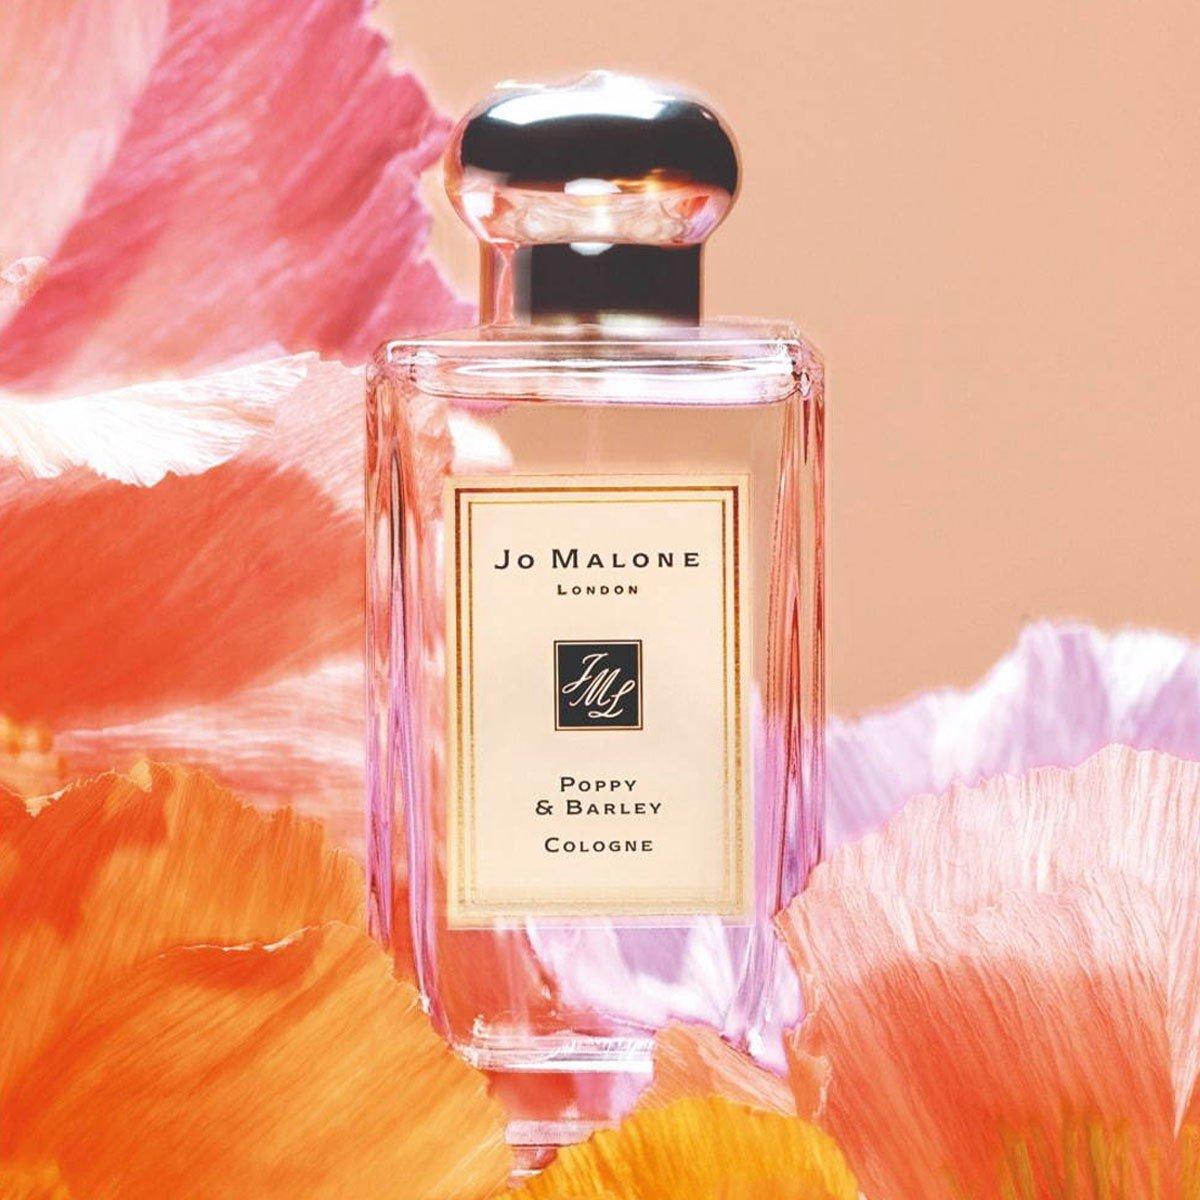 Nước hoa Jo Malone Poppy & Barley Cologne | namperfume